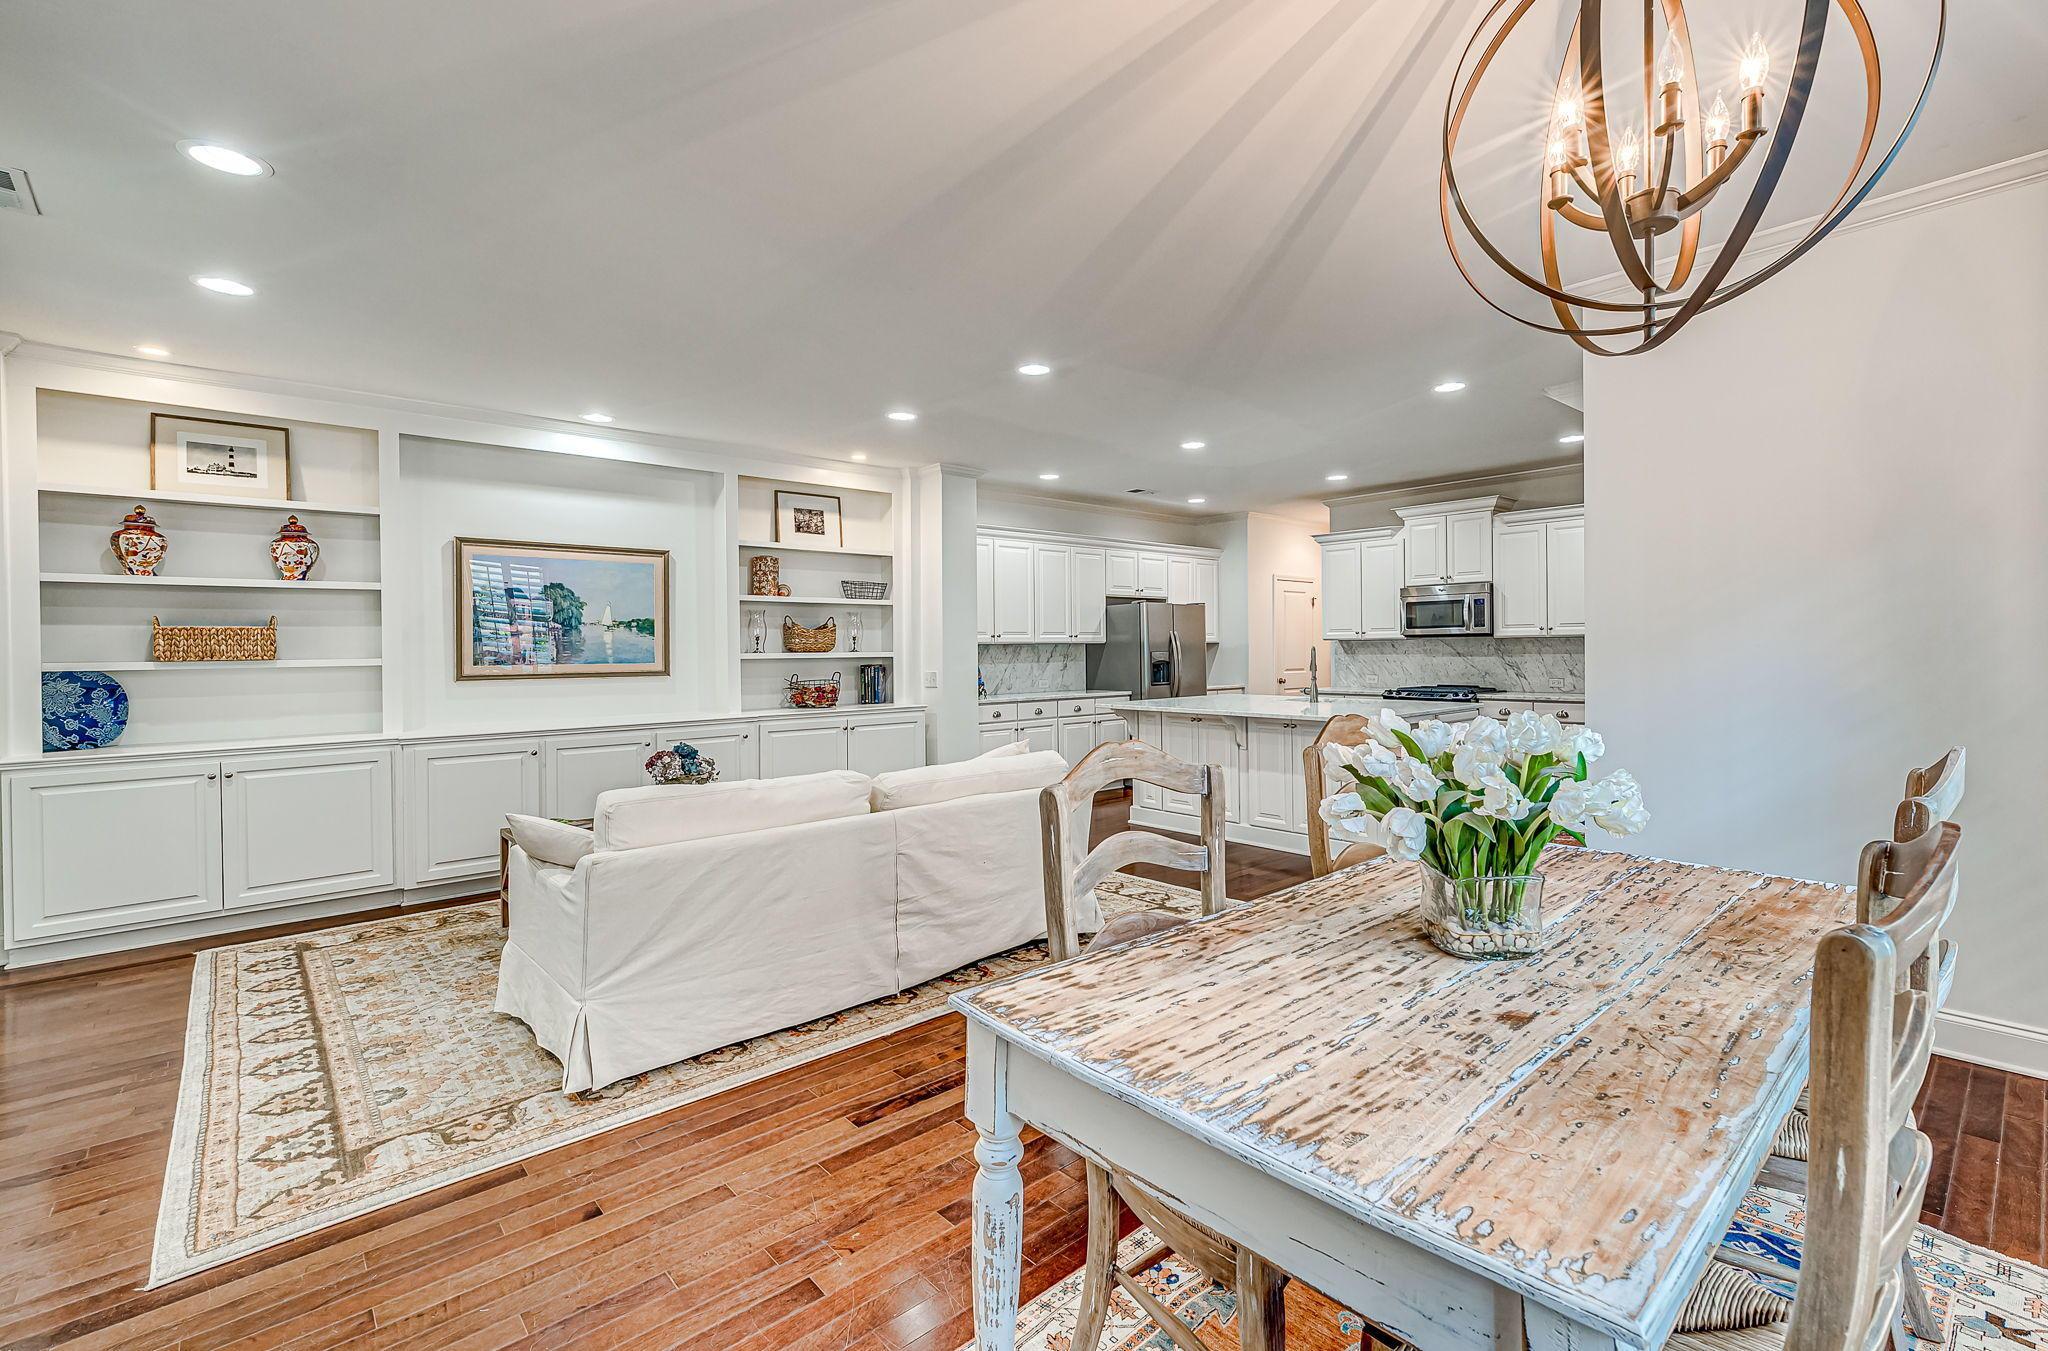 Dunes West Homes For Sale - 2476 Kings Gate, Mount Pleasant, SC - 43